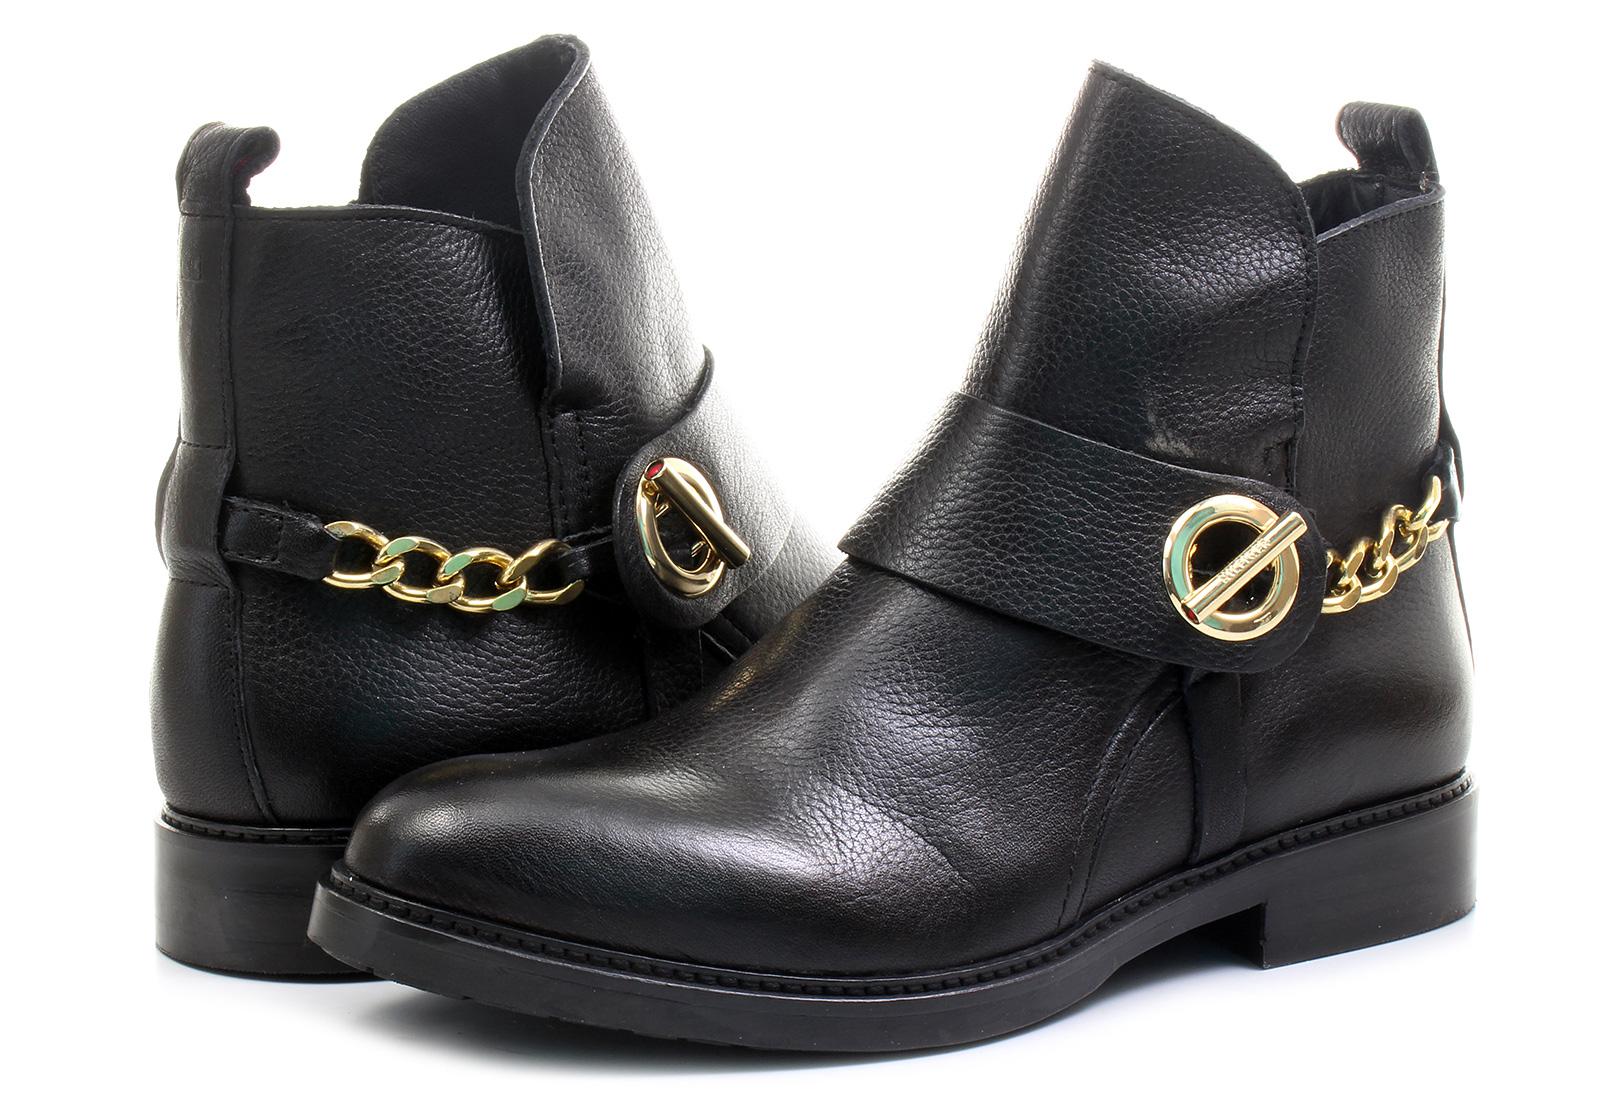 Tommy Hilfiger Csizma - Holly 1a - 15F-9490-990 - Office Shoes ... cc36943e6c